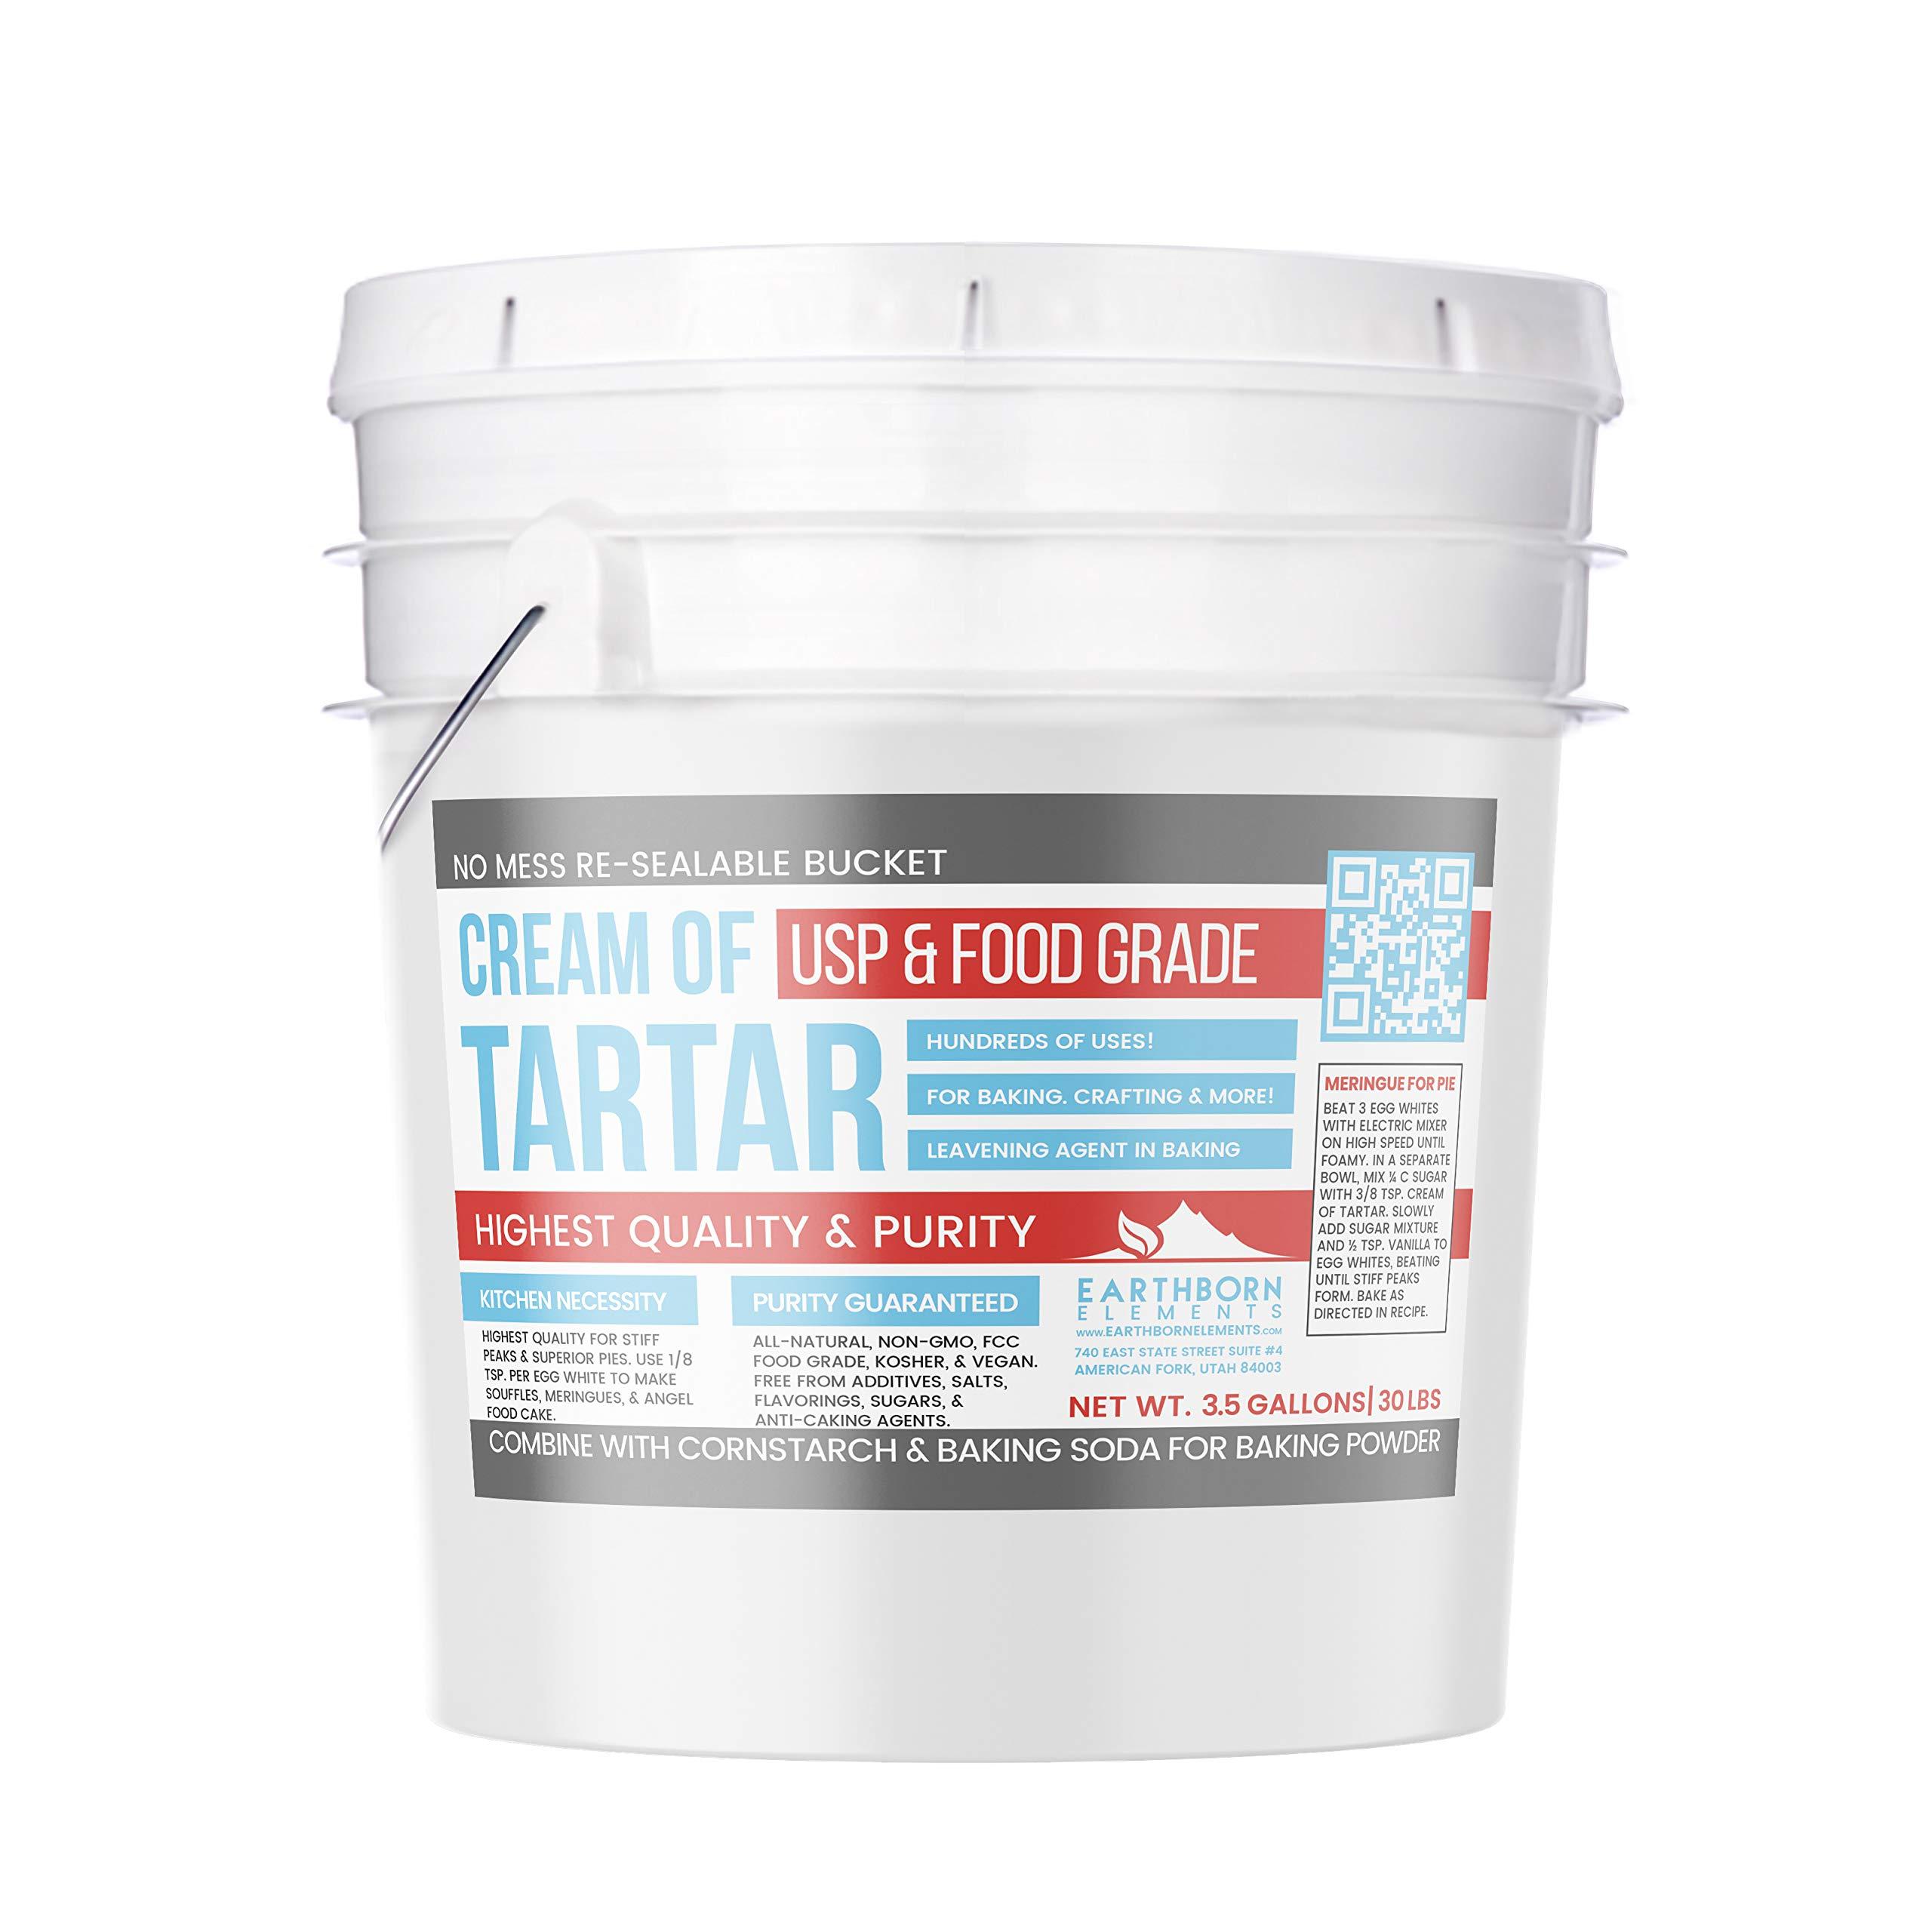 Cream of Tartar (3.5 Gallon) by Earthborn Elements, Resealable Bucket, Highest Purity, Baking Additive, Non-GMO, Kosher, Gluten-Free, All-Natural, DIY Bath Bombs by Earthborn Elements (Image #1)